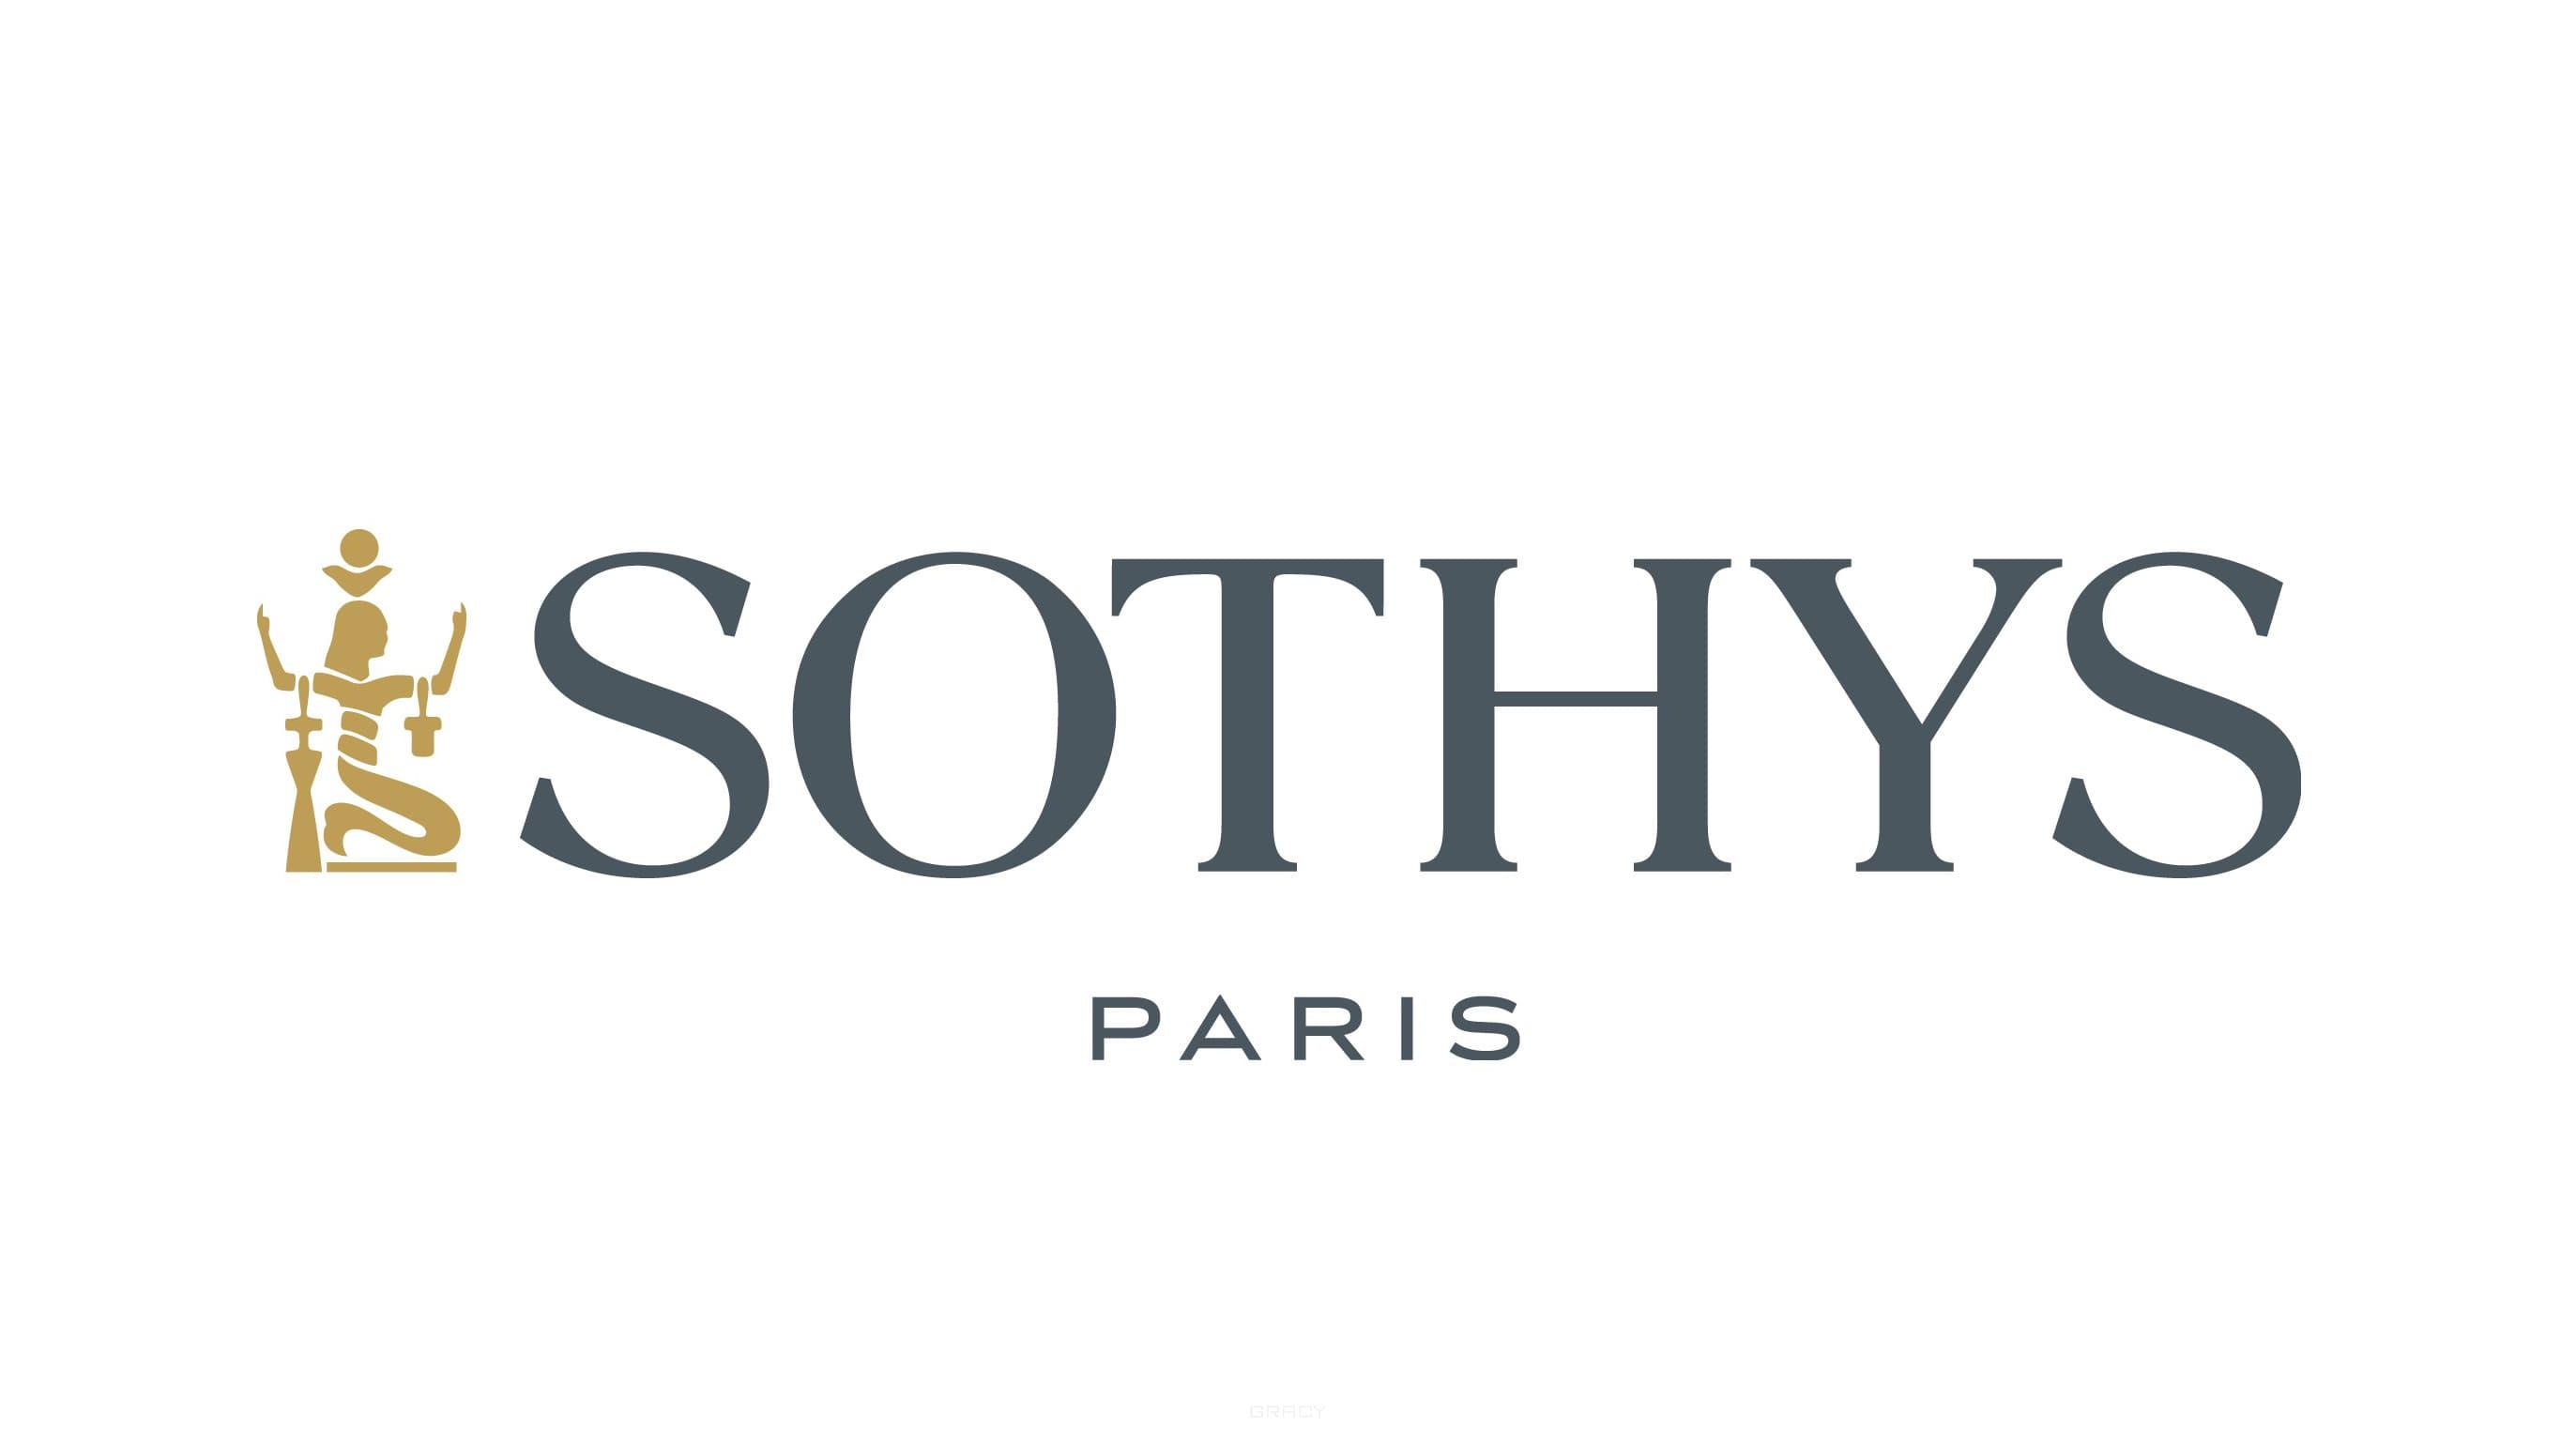 Sothys, Скраб для тела ревитализирующий Shower Body Scrub, 200 мл ревитализирующий гельшампунь для волос и тела 200 мл sothys homme